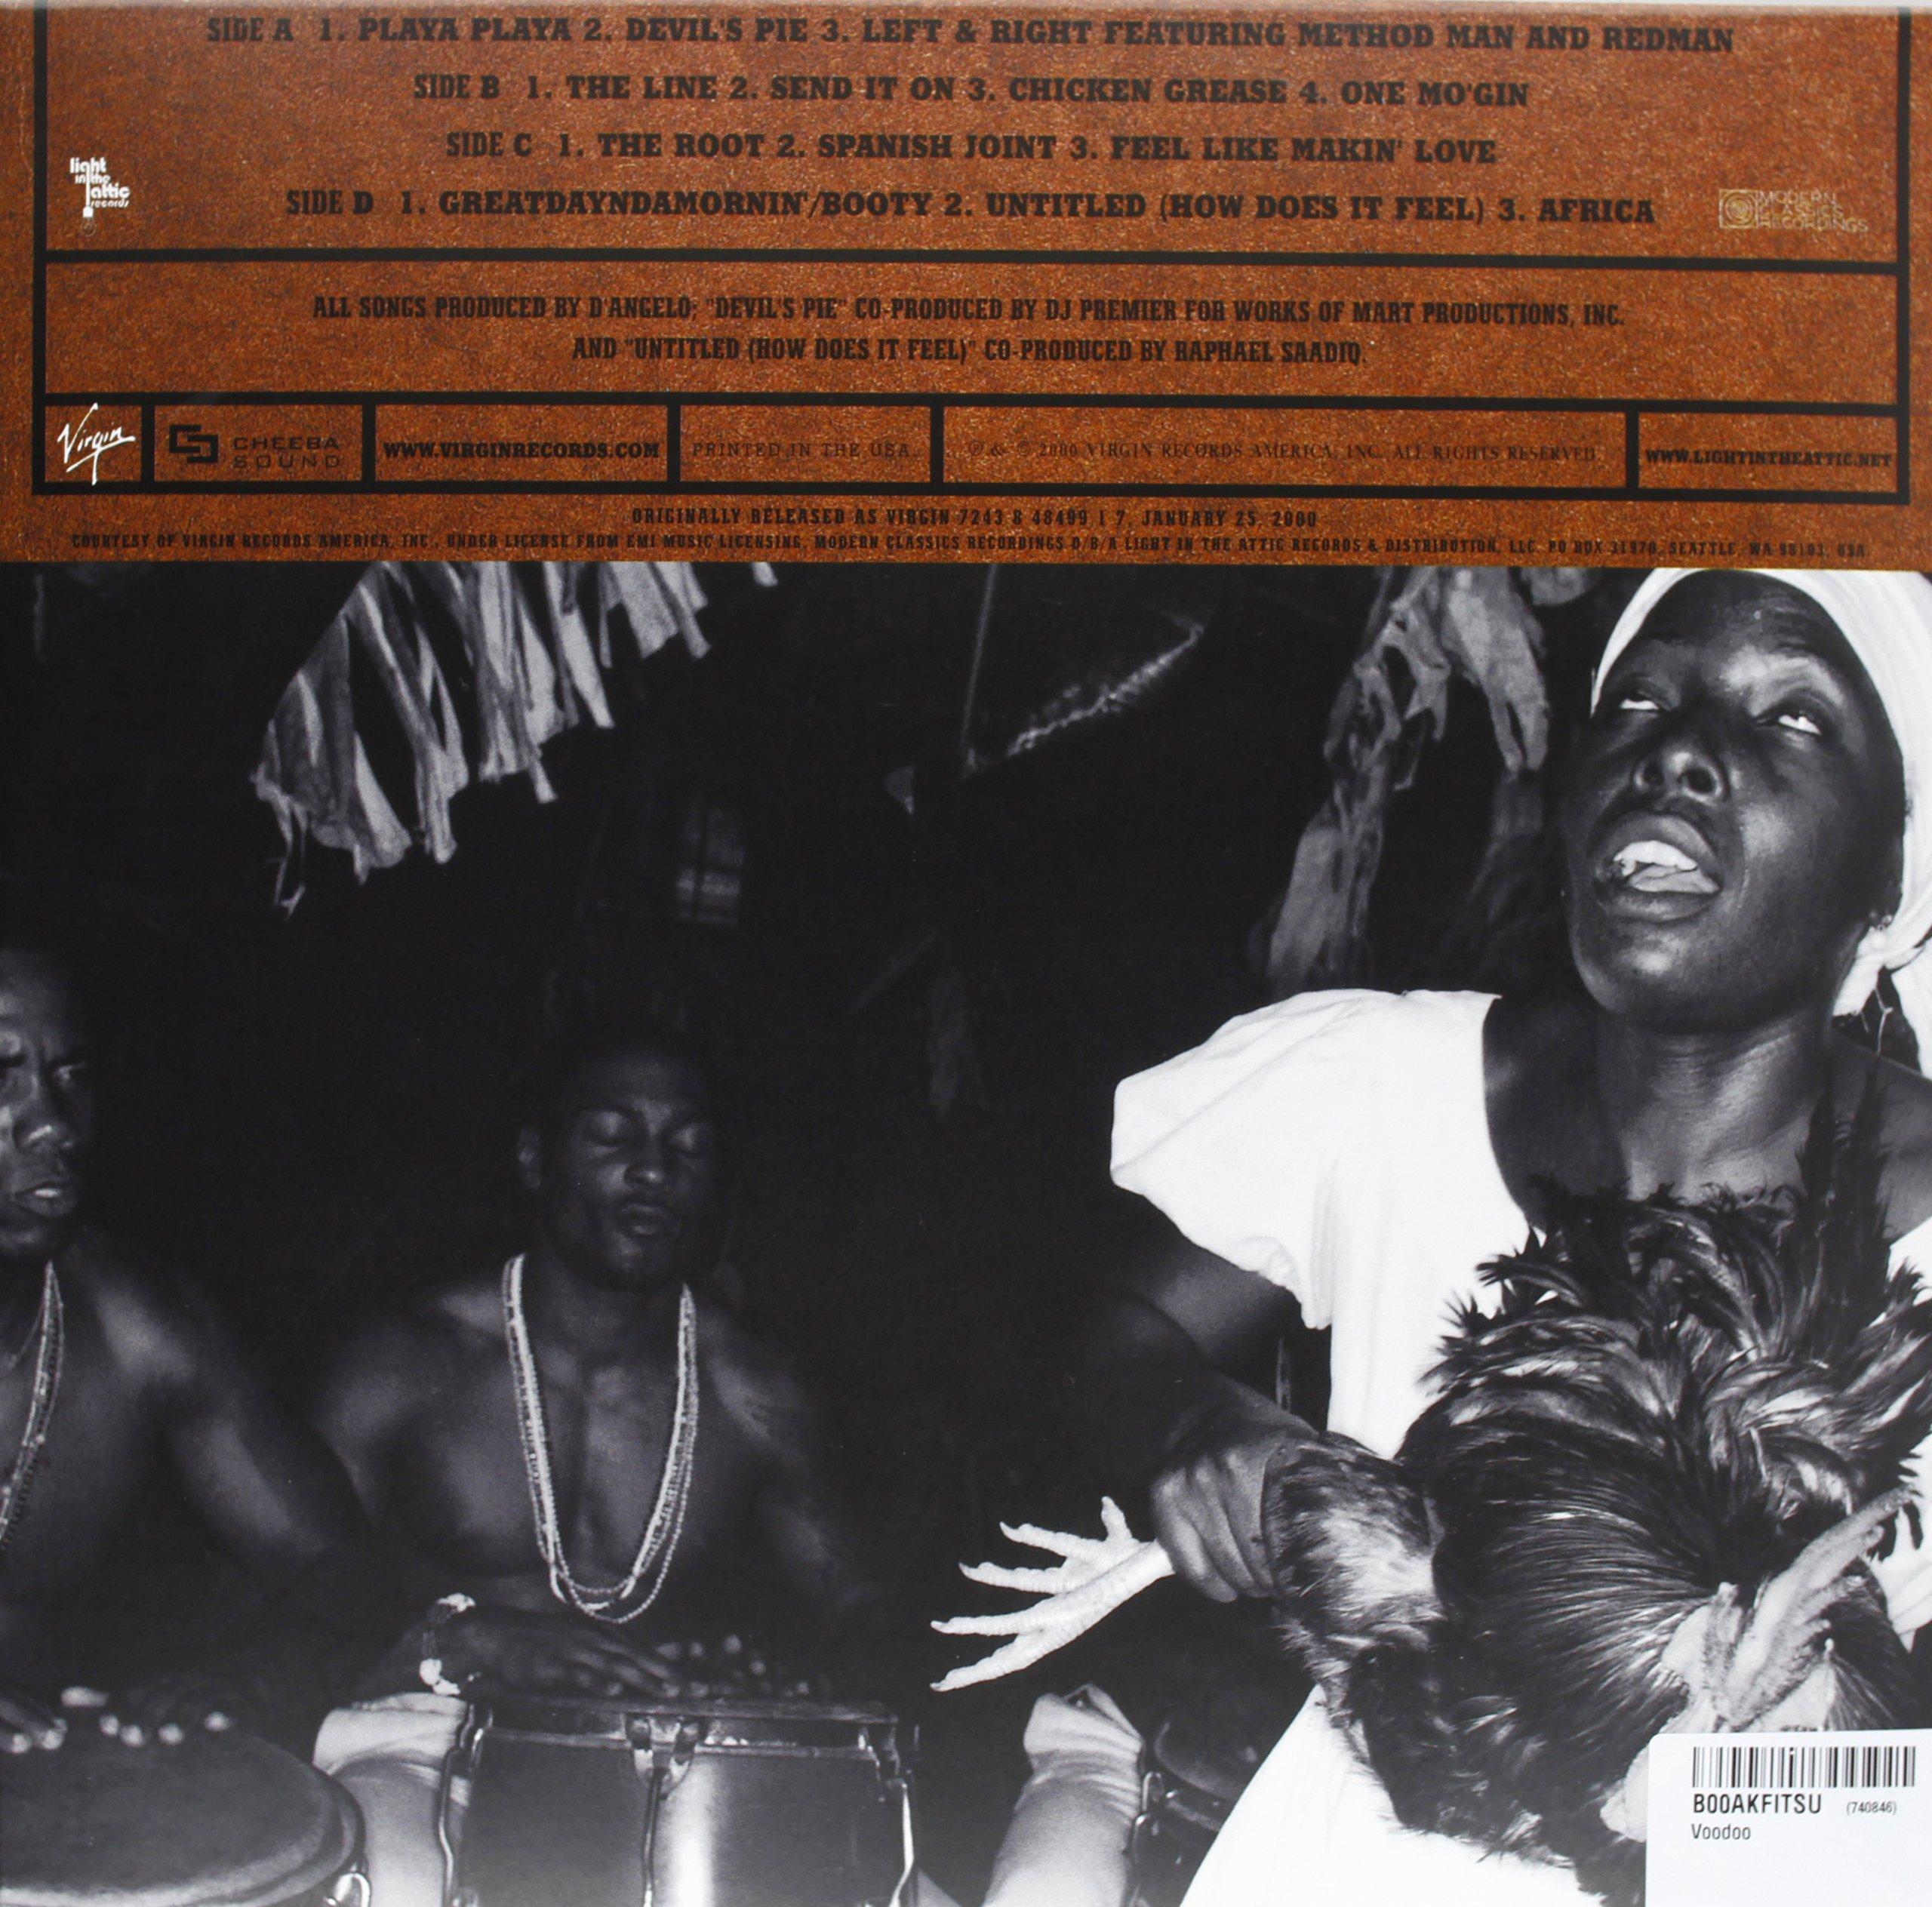 Voodoo [2-LP Gatefold Vinyl]